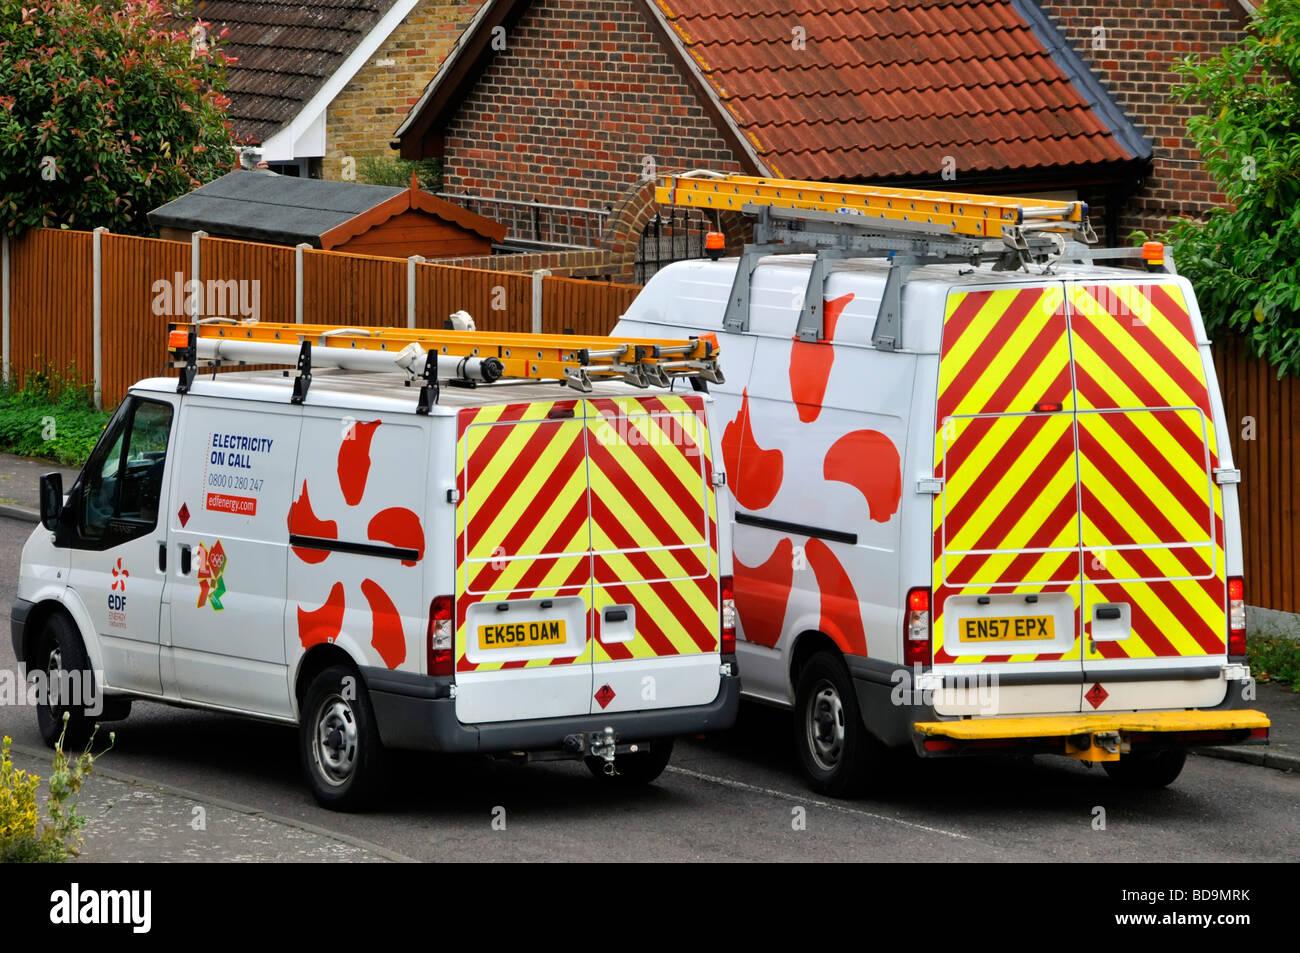 EDF Electricity on call engineers vans in residential street - Stock Image